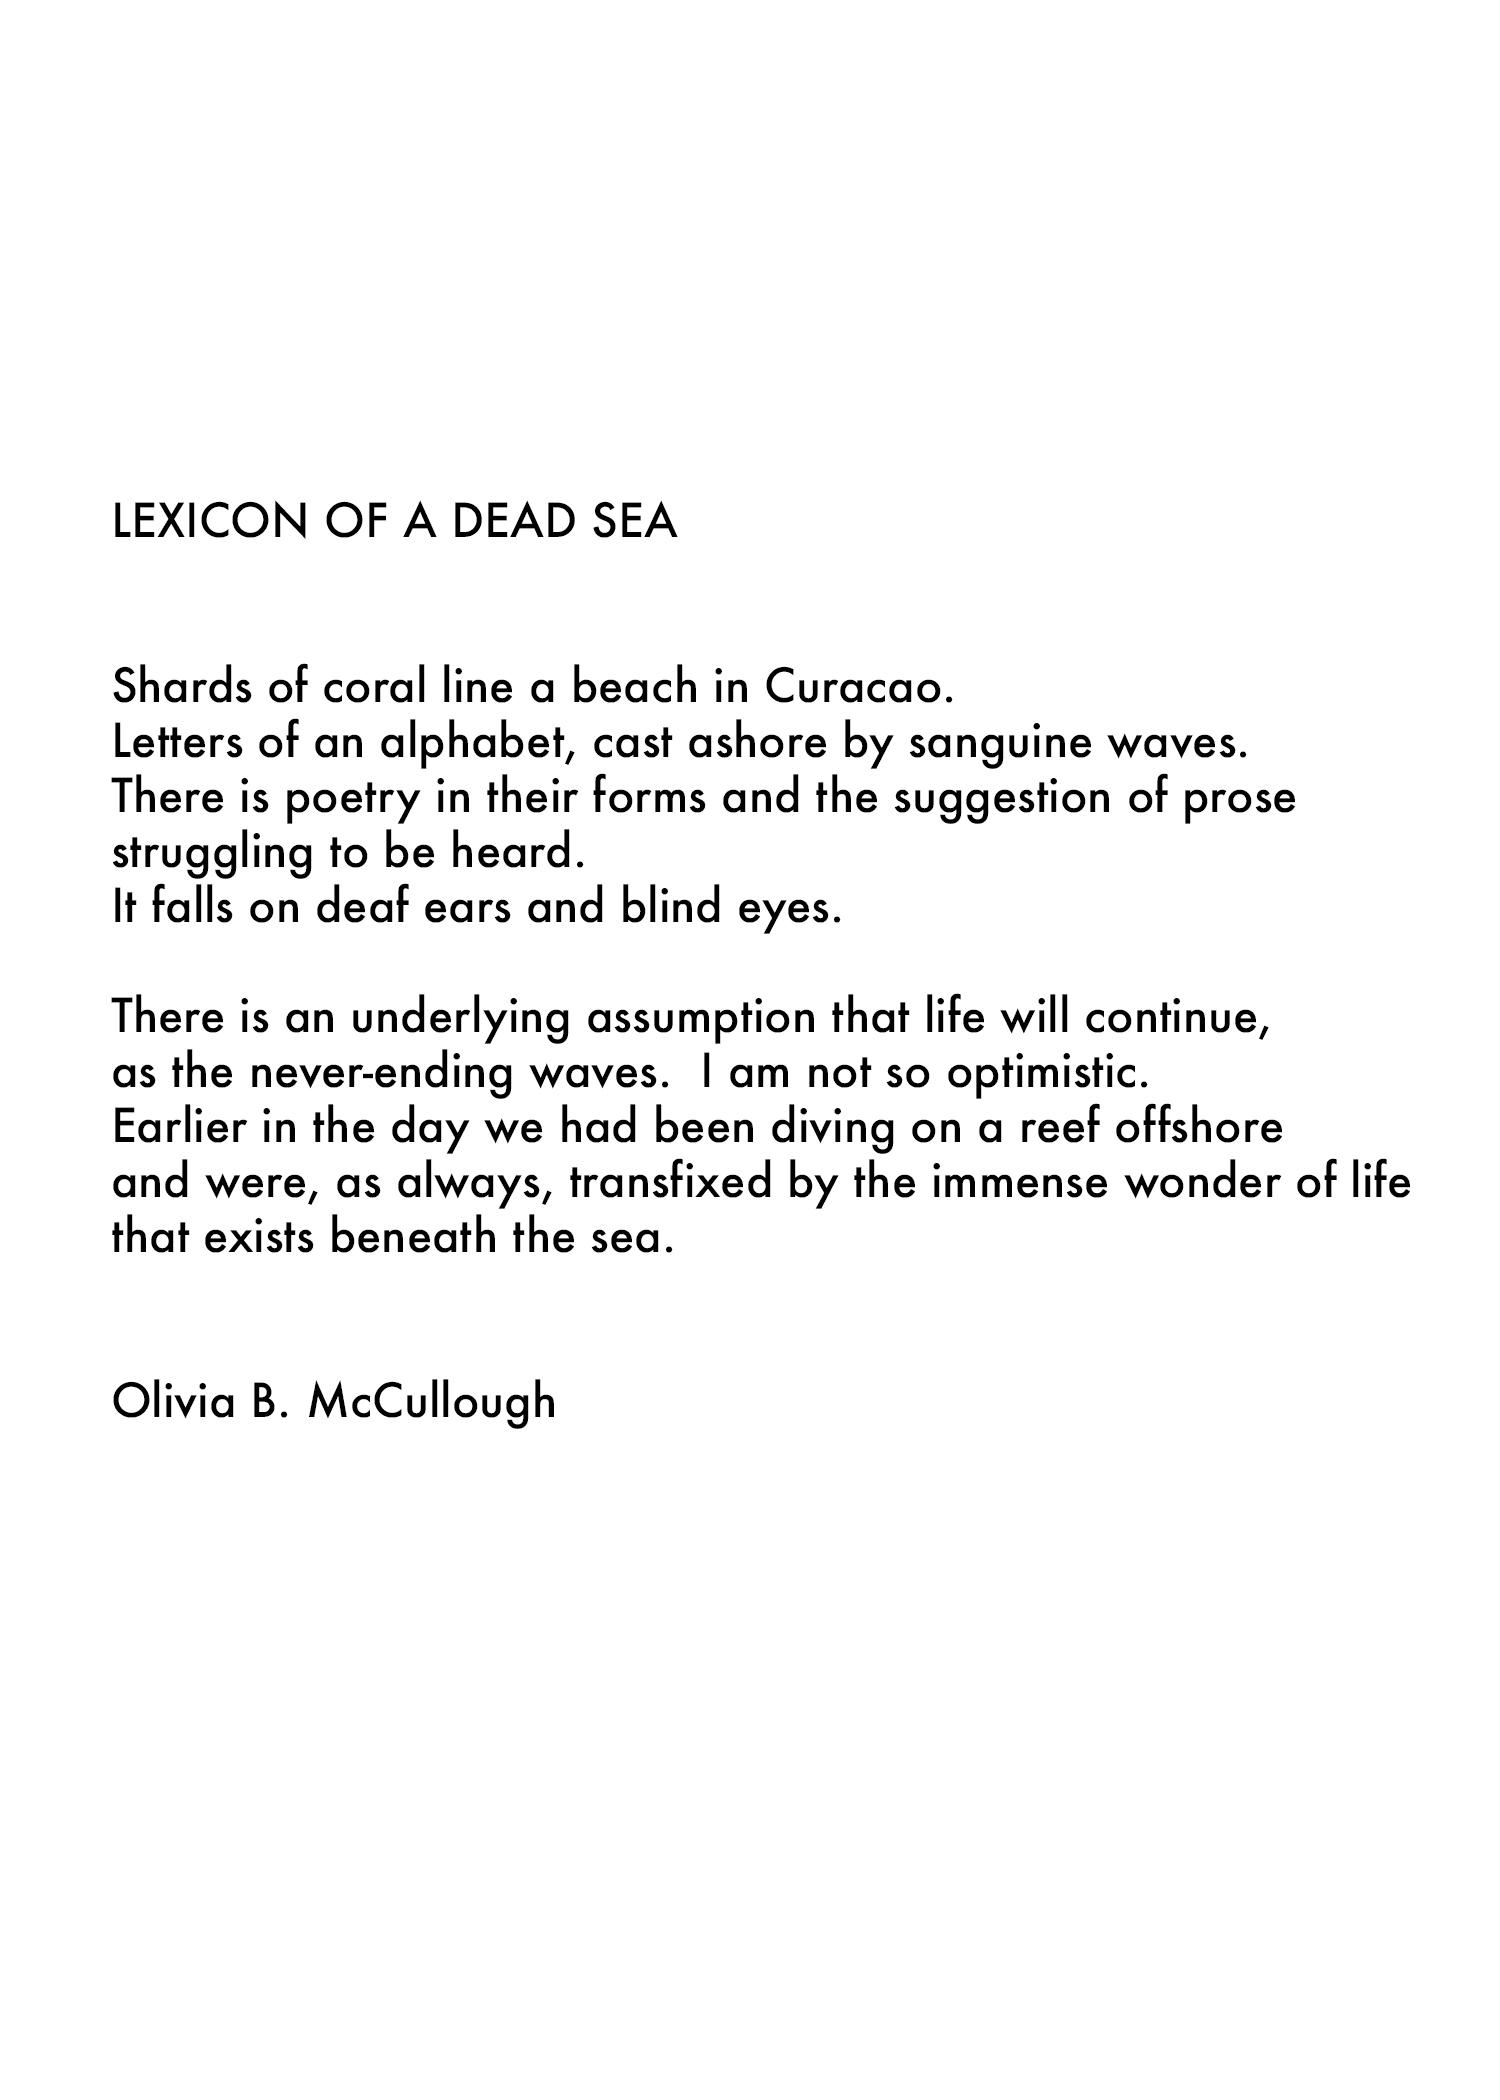 Dead-Sea-Statement.jpg